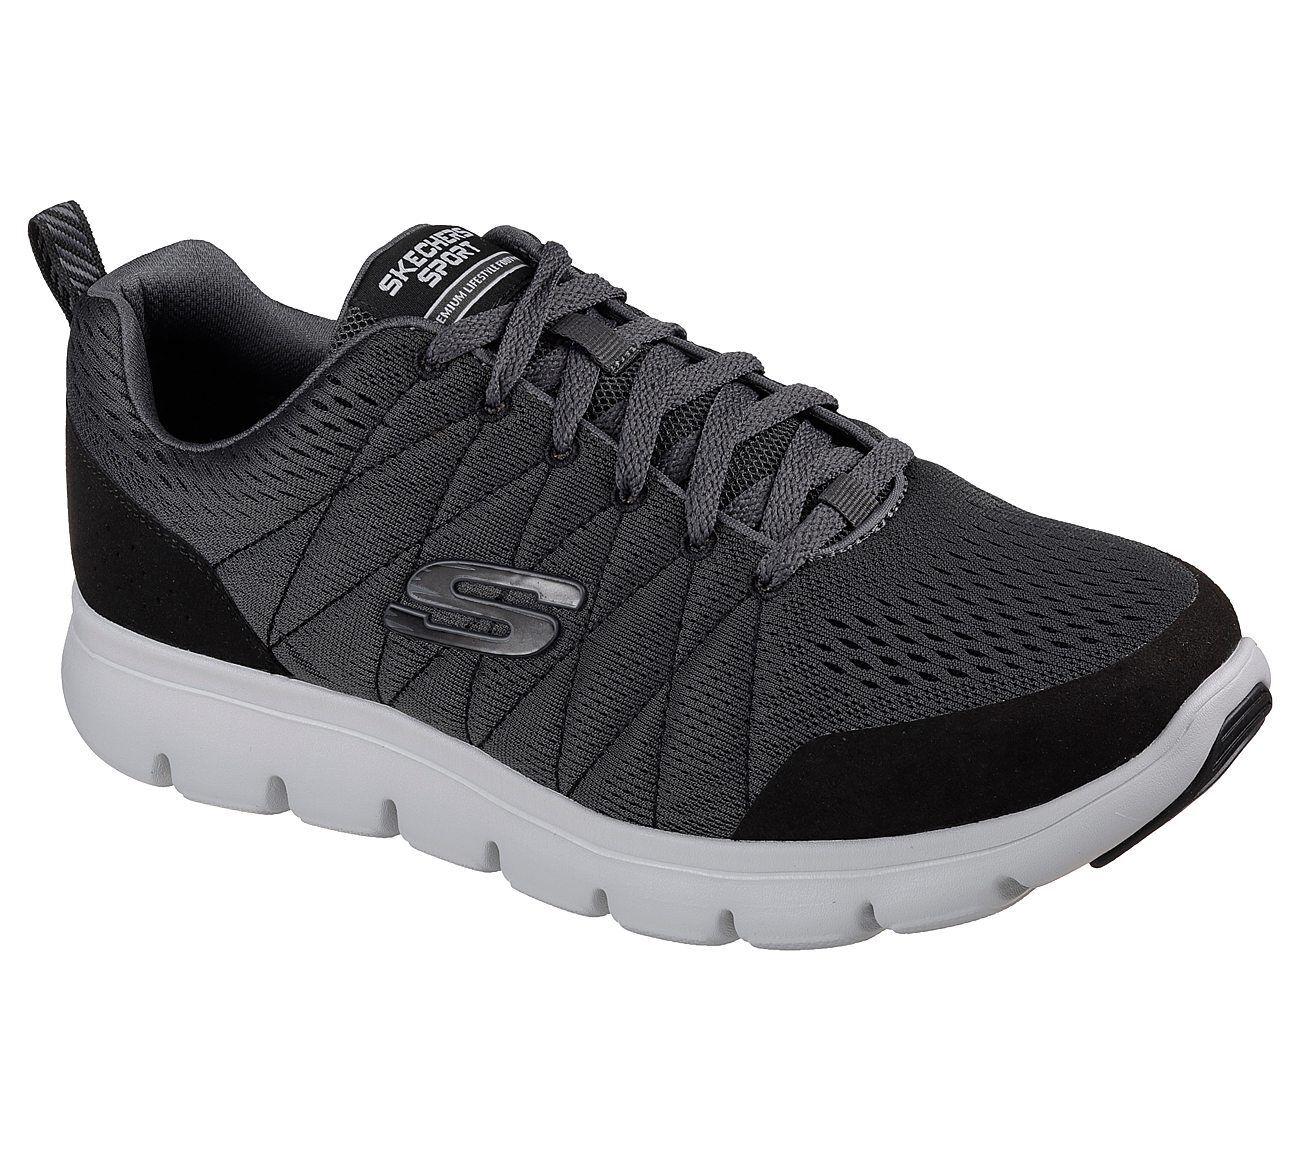 SKECHERS MARAUDER - MERSHION - 52836 CCBK - MENS TRAINERS Cheap women's shoes women's shoes